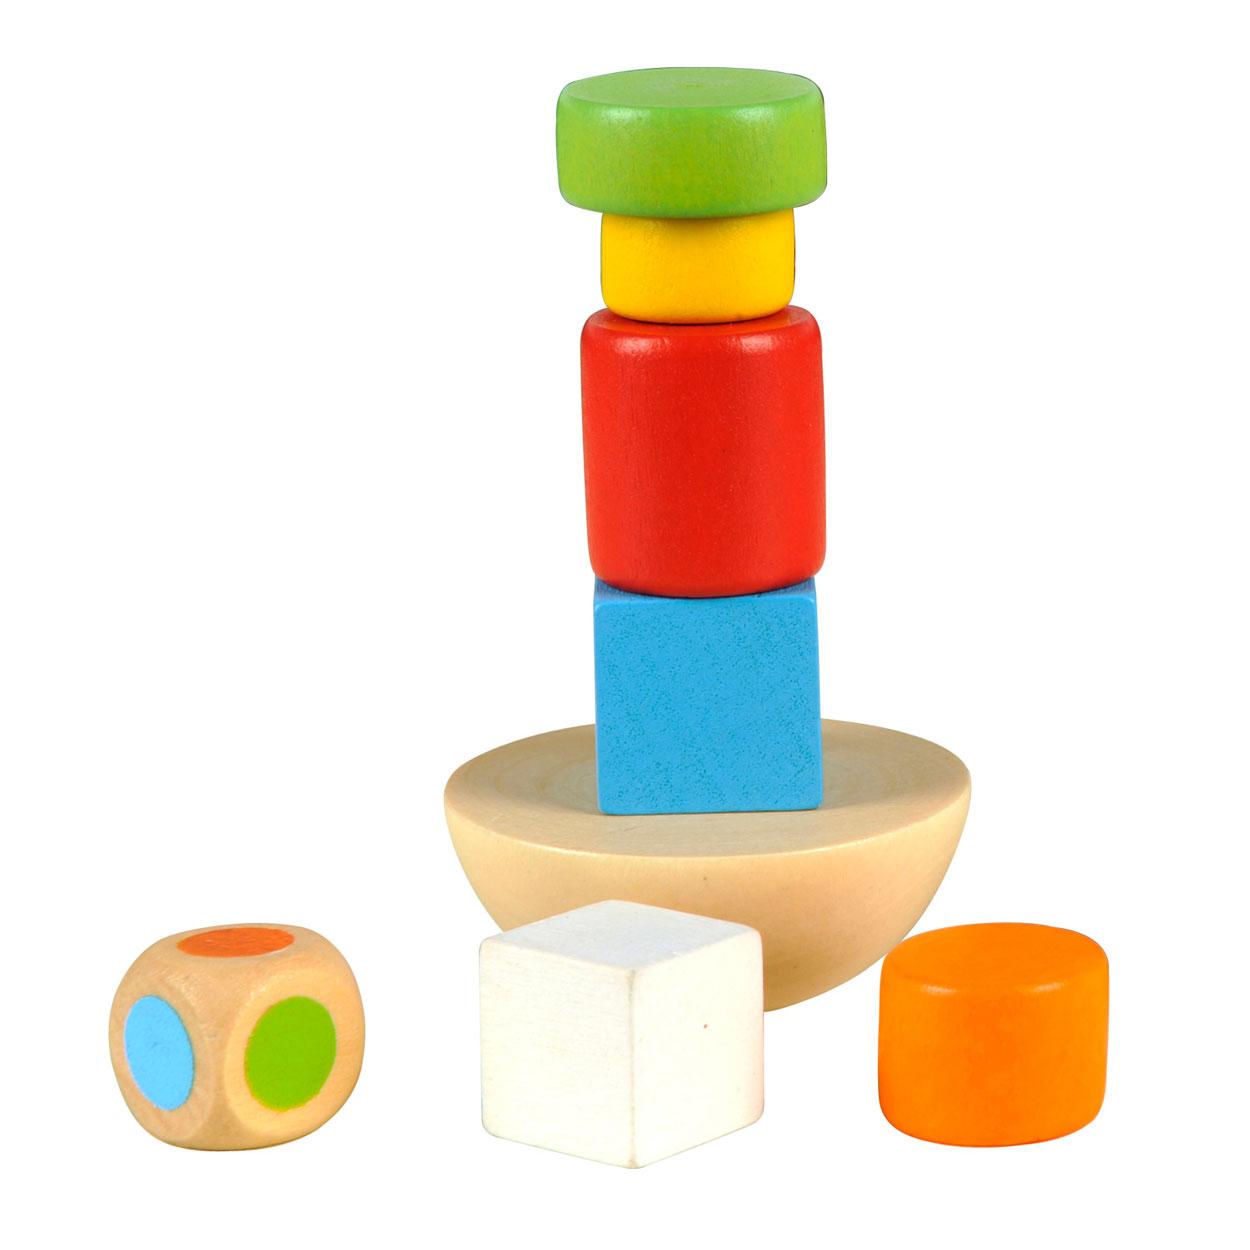 Houten Balansspel in Blik online kopen | Lobbes Speelgoed